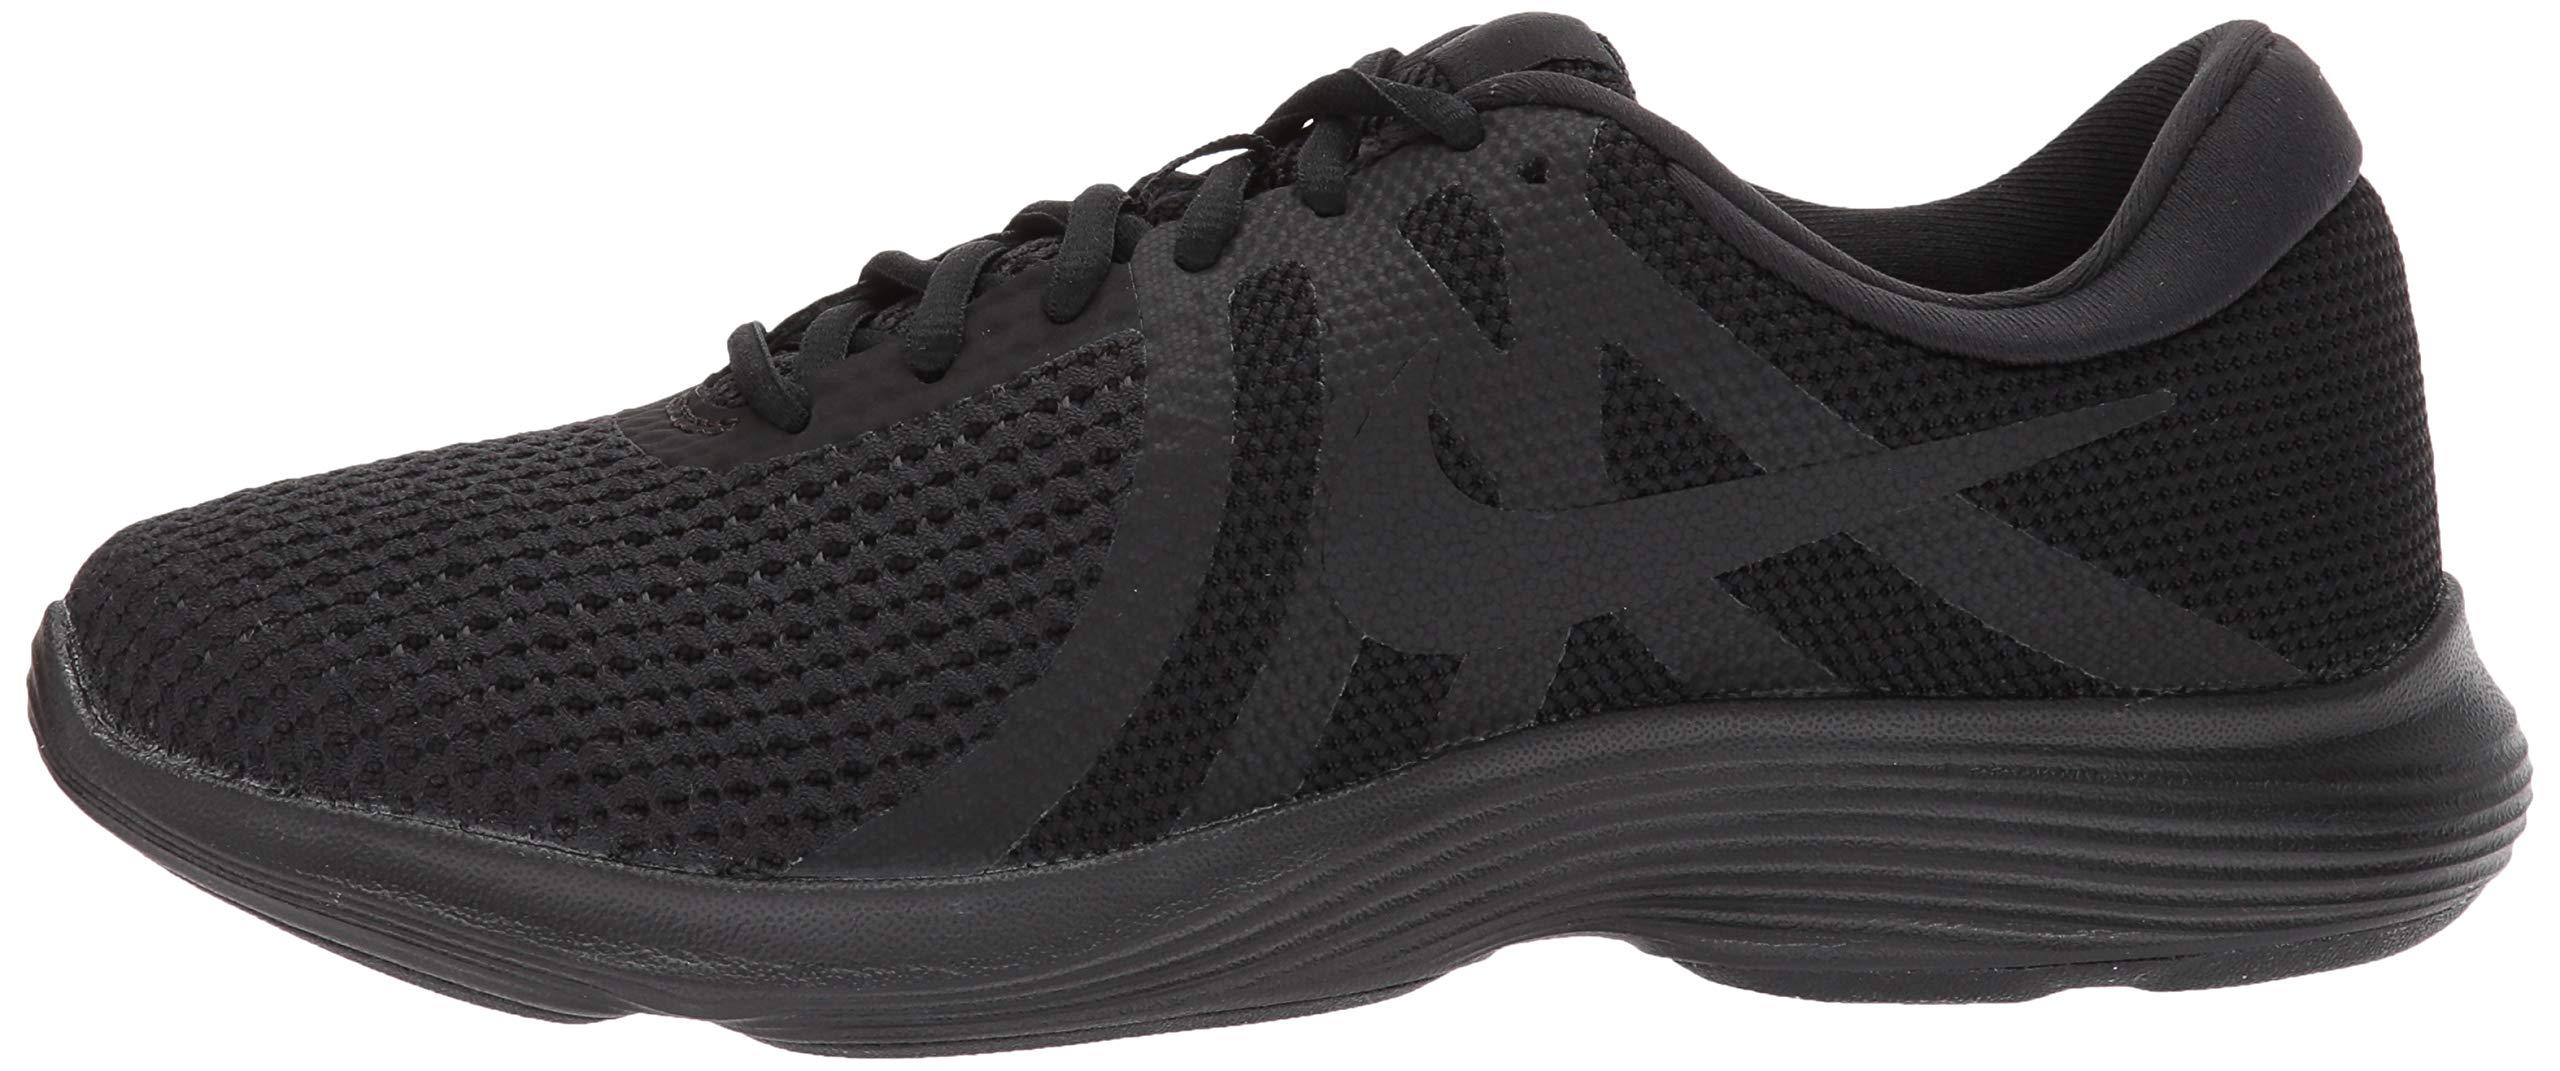 Nike Men's Revolution 4 Running Shoe, Black/White-Anthracite, 7 Regular US by Nike (Image #5)